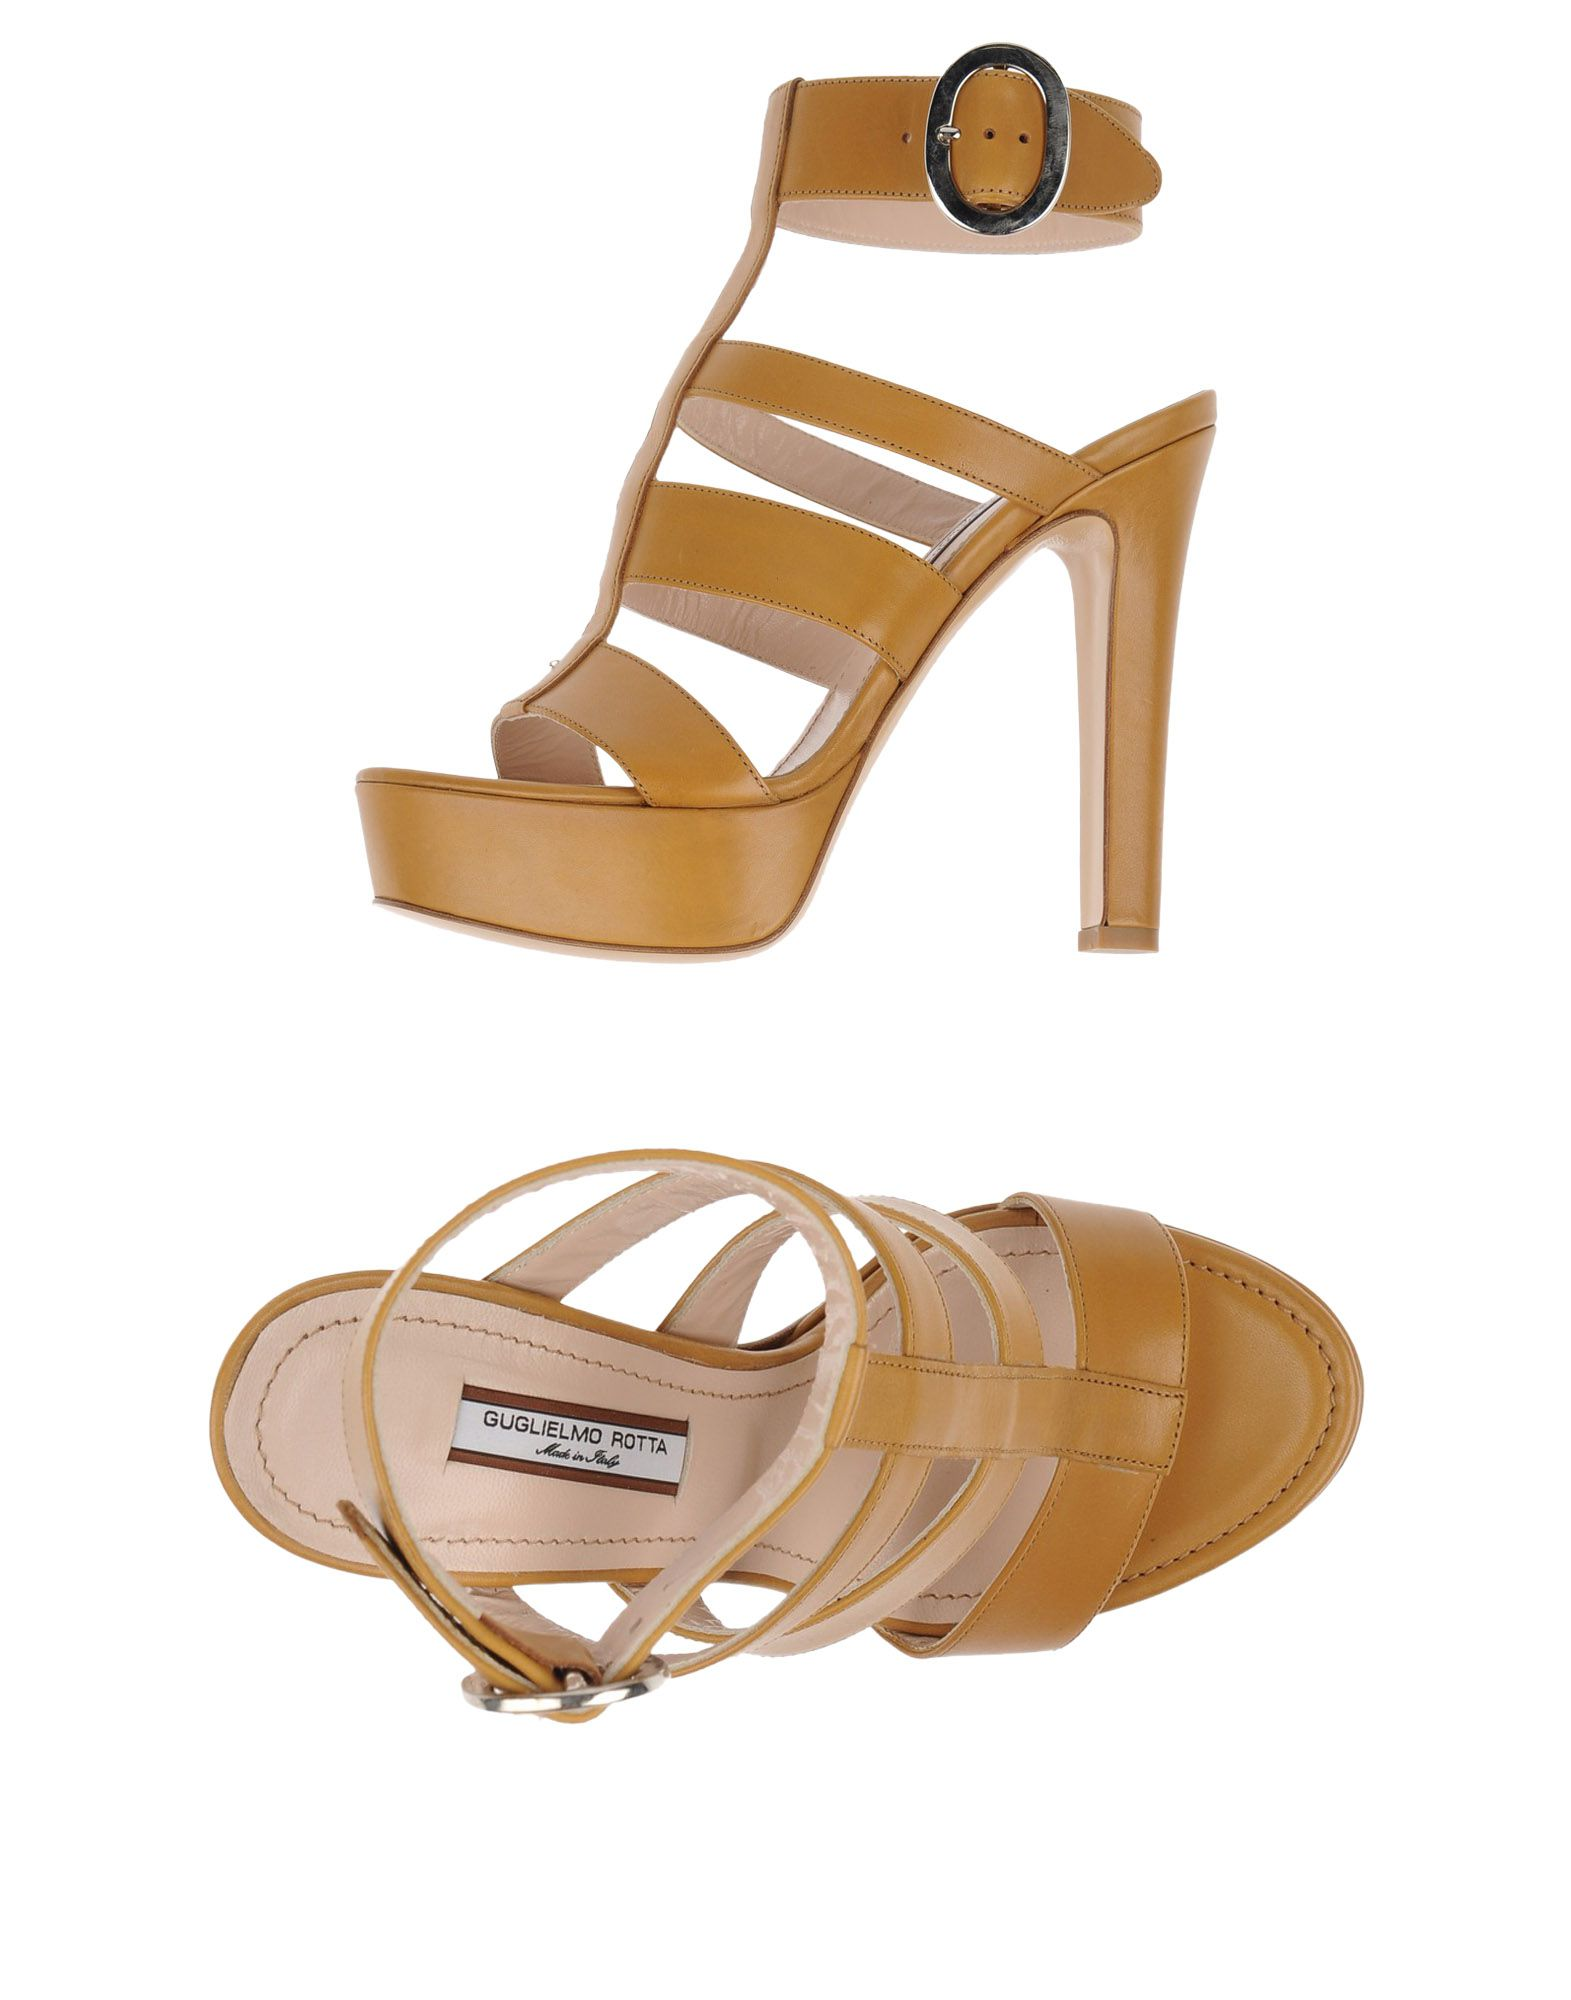 Guglielmo Rotta Sandalen Damen  44925653KK Gute Qualität beliebte Schuhe